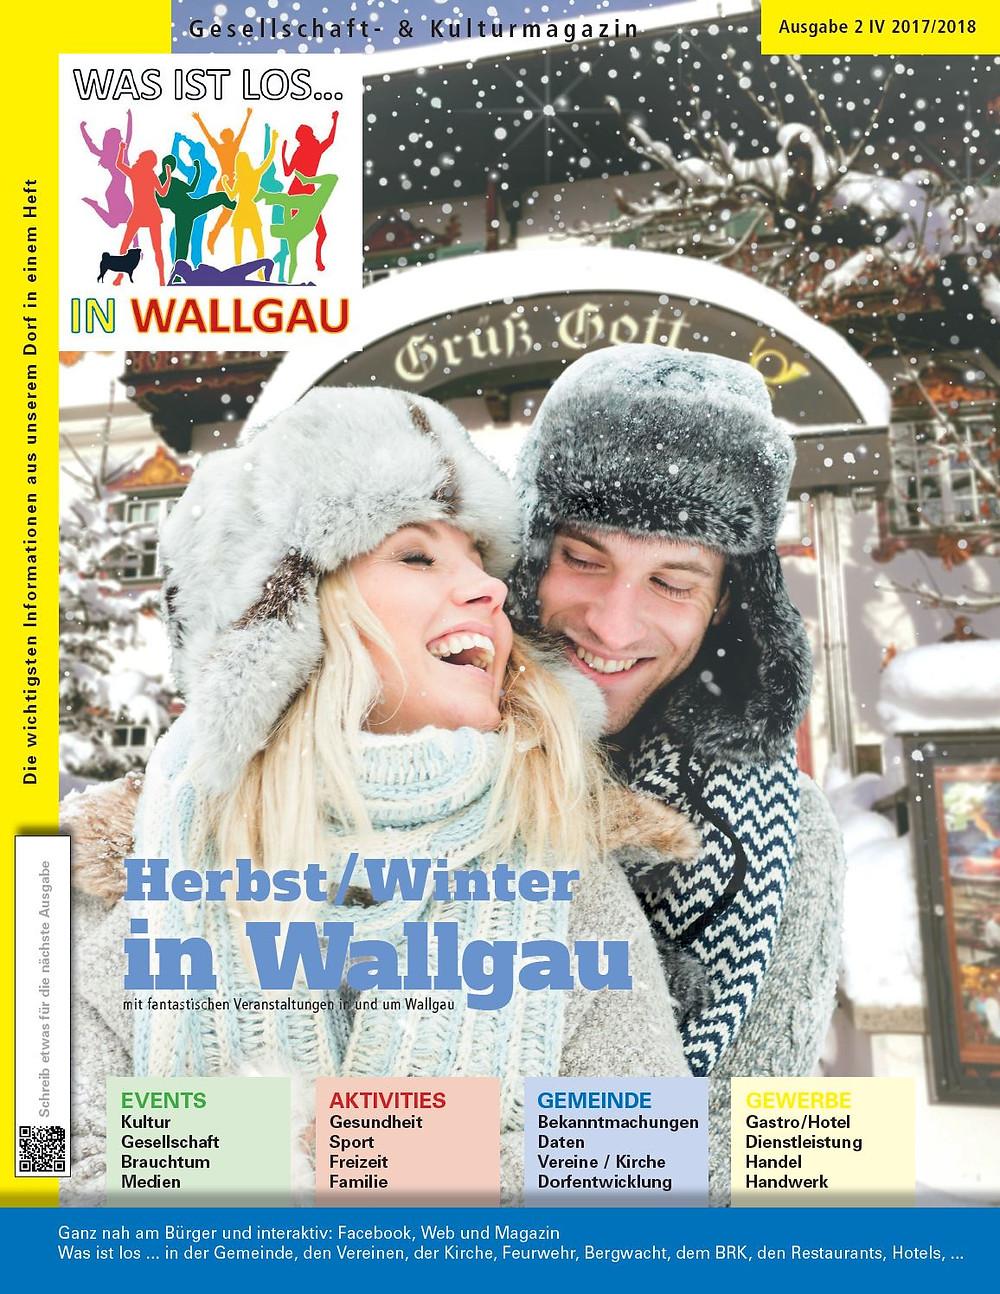 Was ist los in Wallgau - Das Magazin